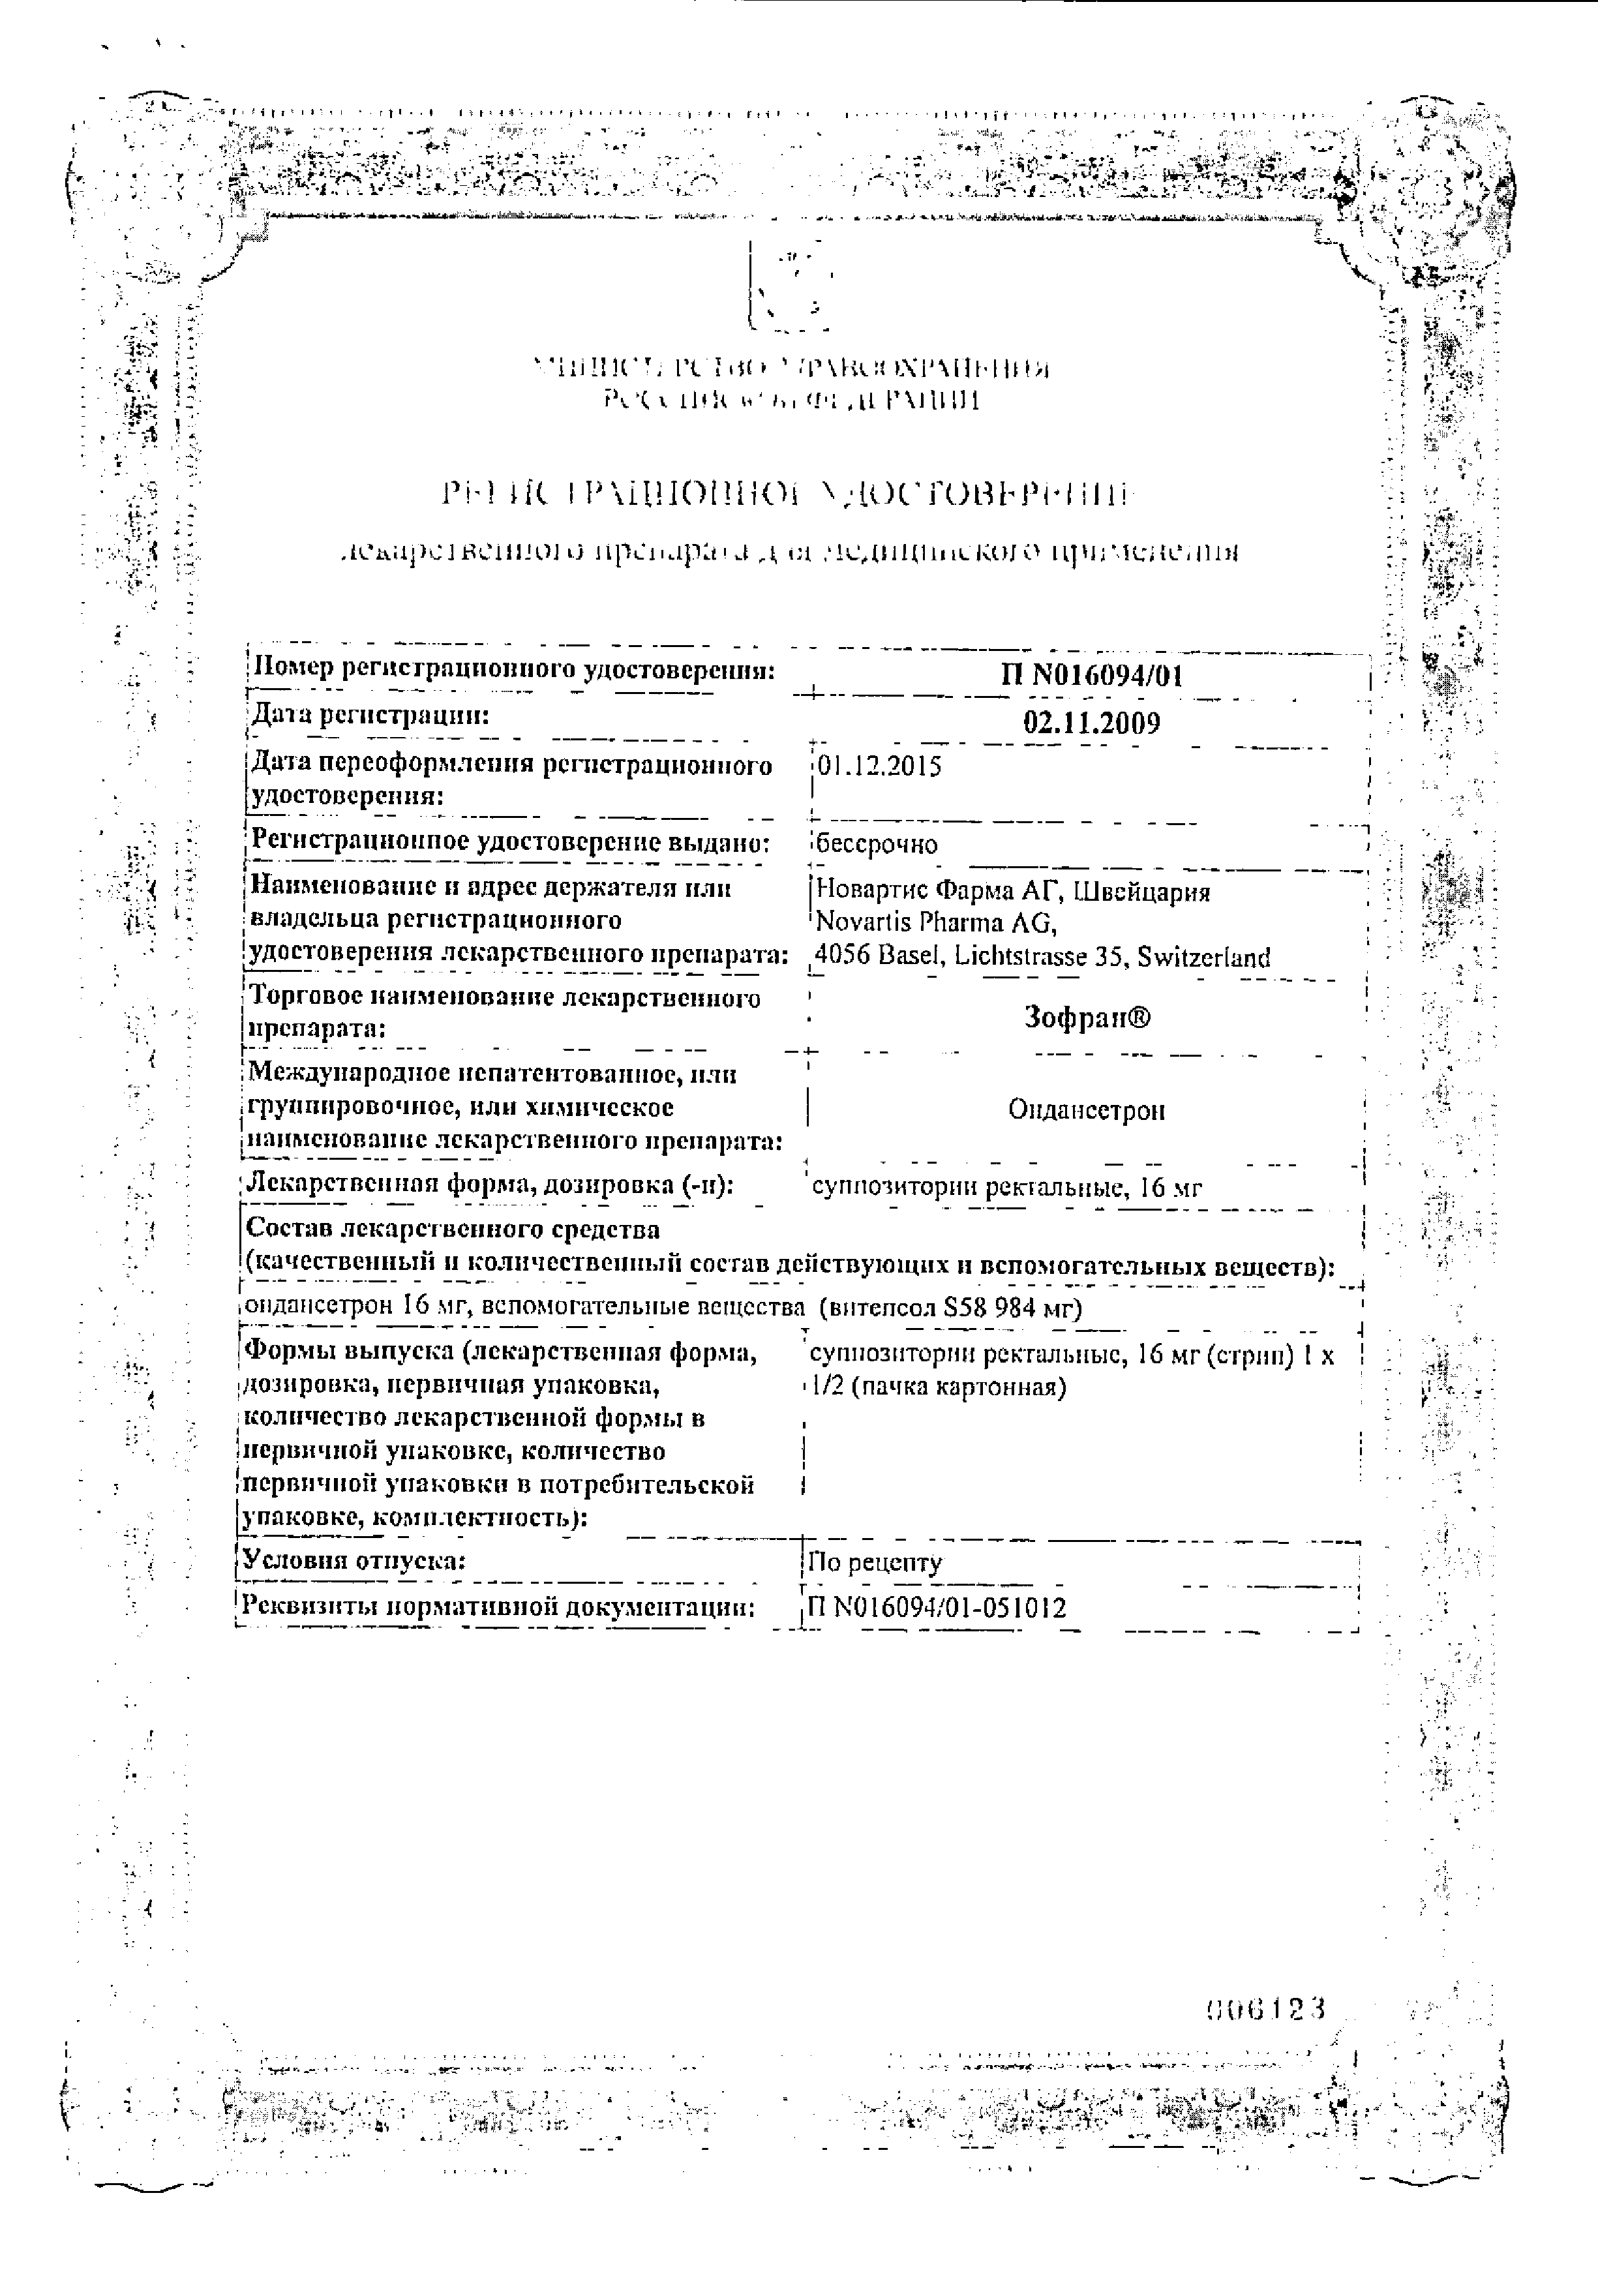 Зофран сертификат